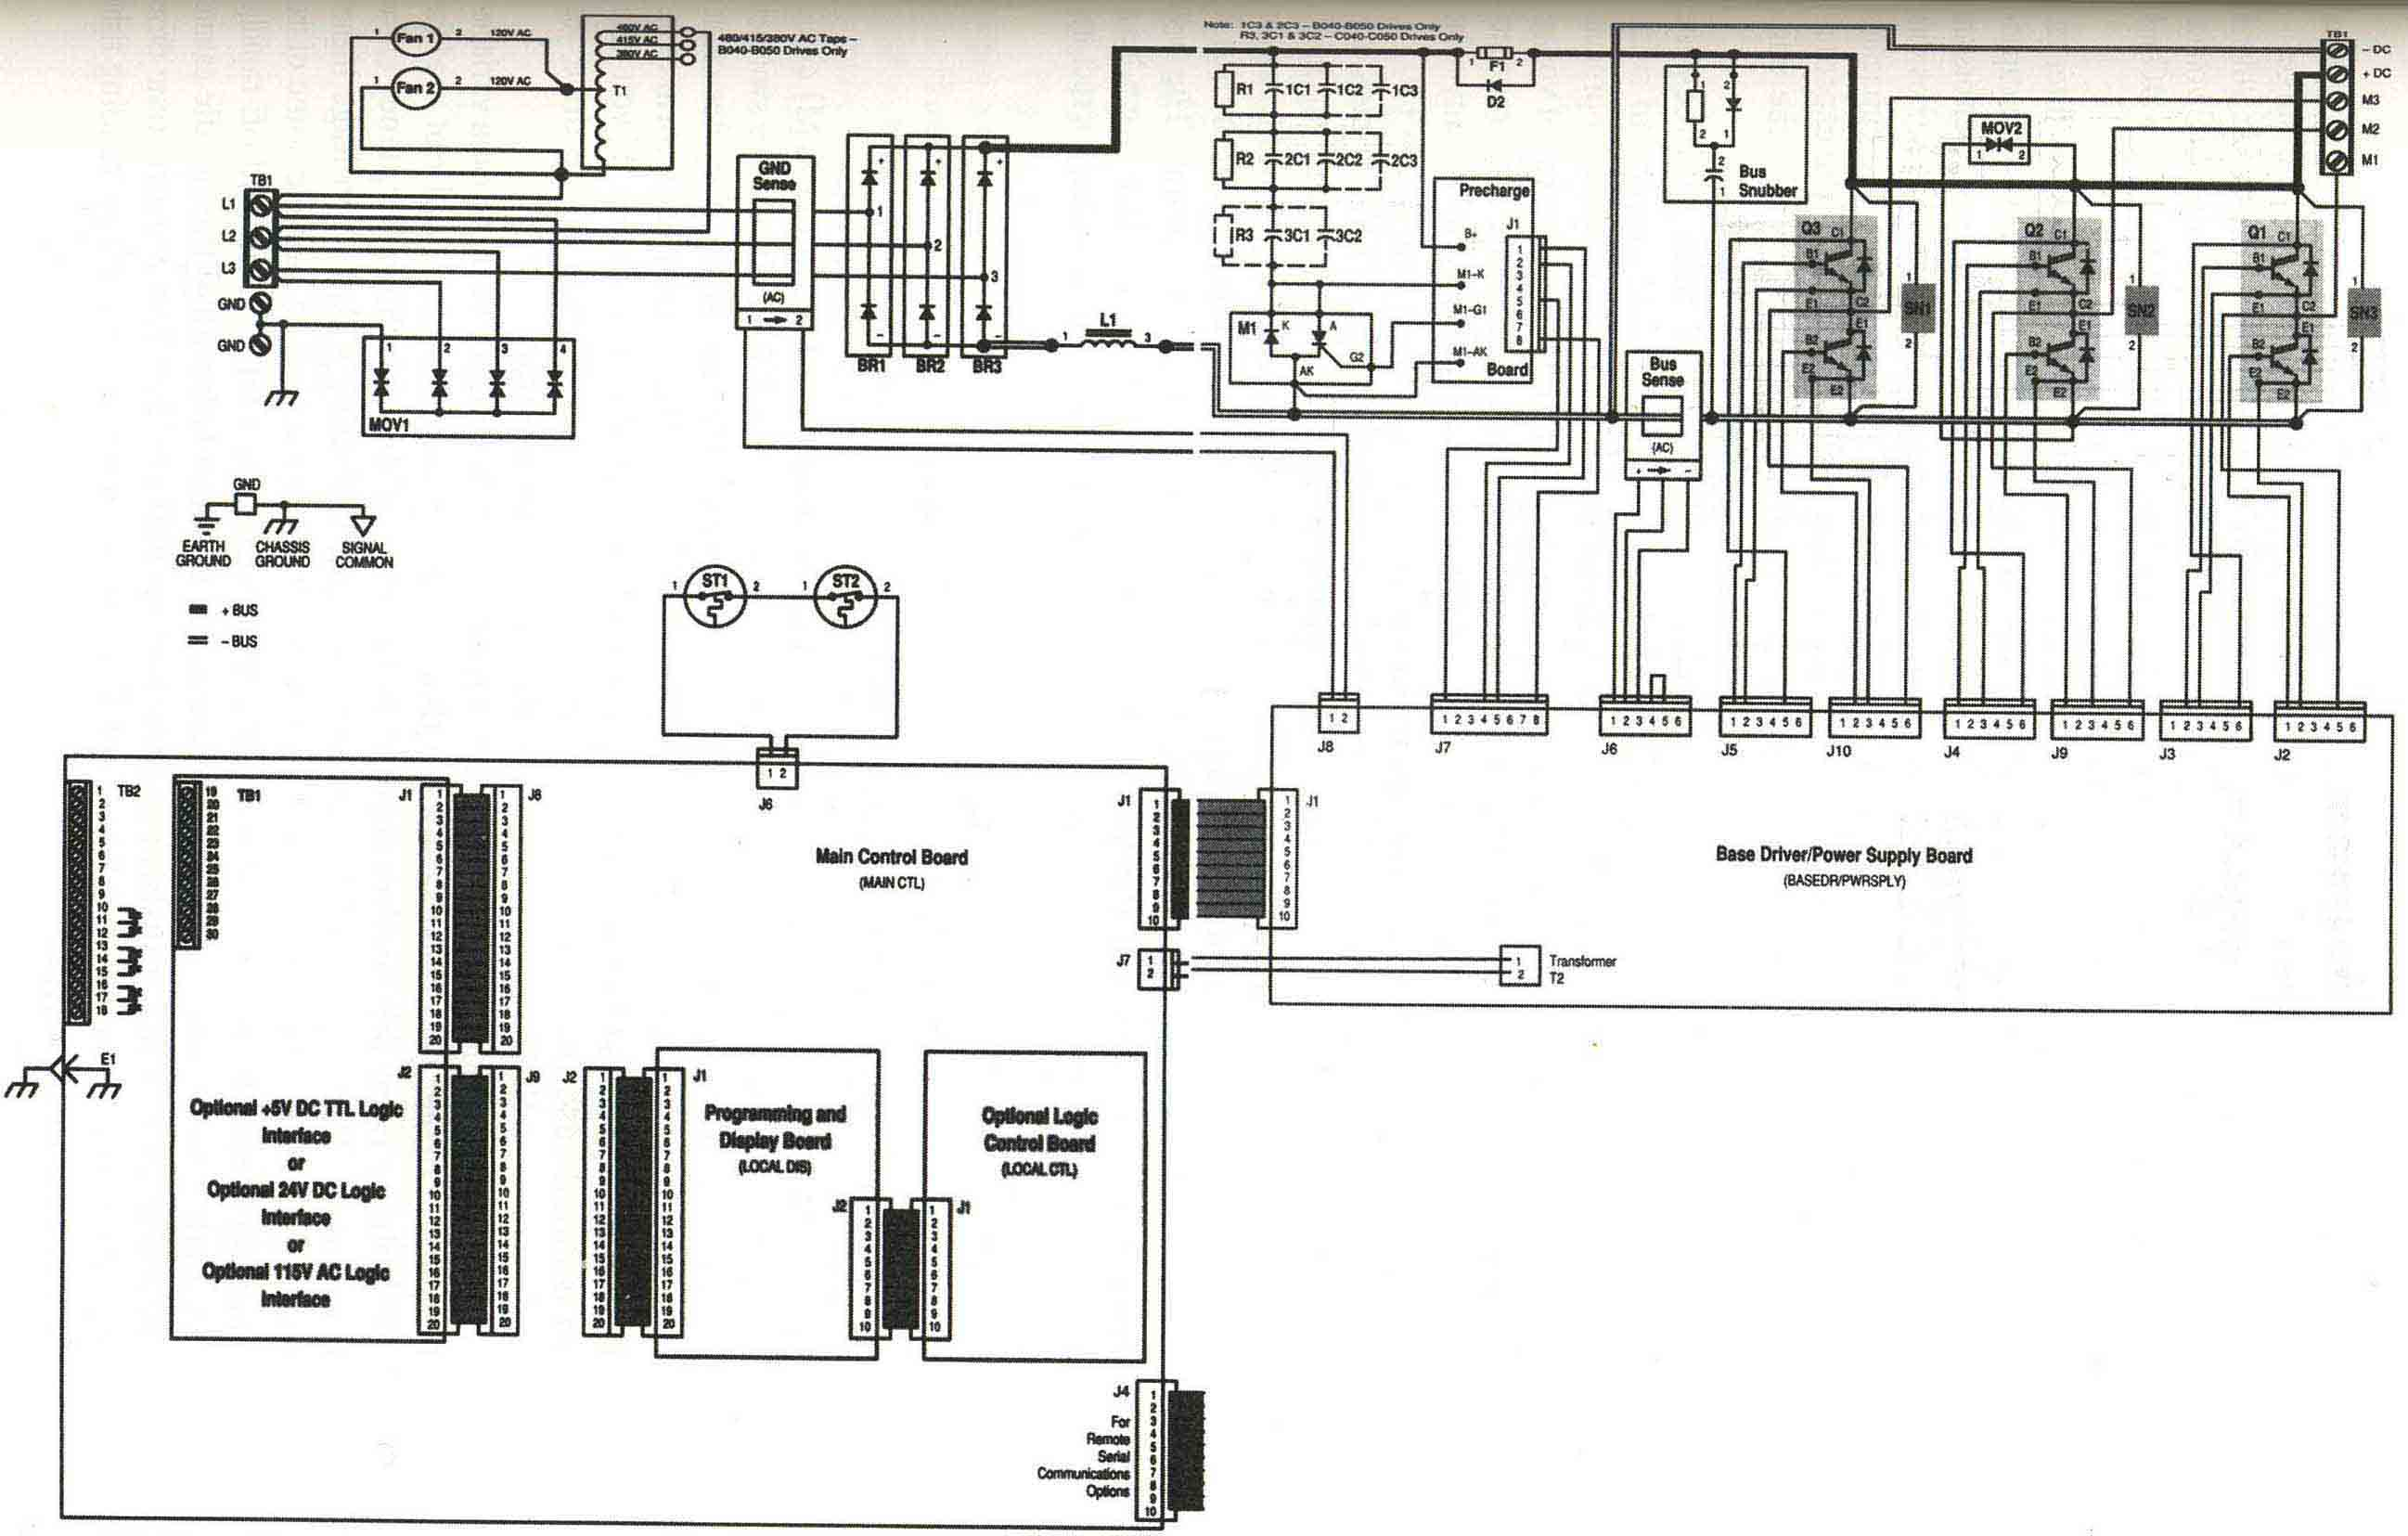 open house h628 wiring diagram wiring diagram libraries open house h628 wiring diagram wiring libraryac drive wiring ac drive wiring auto electrical wiring diagram